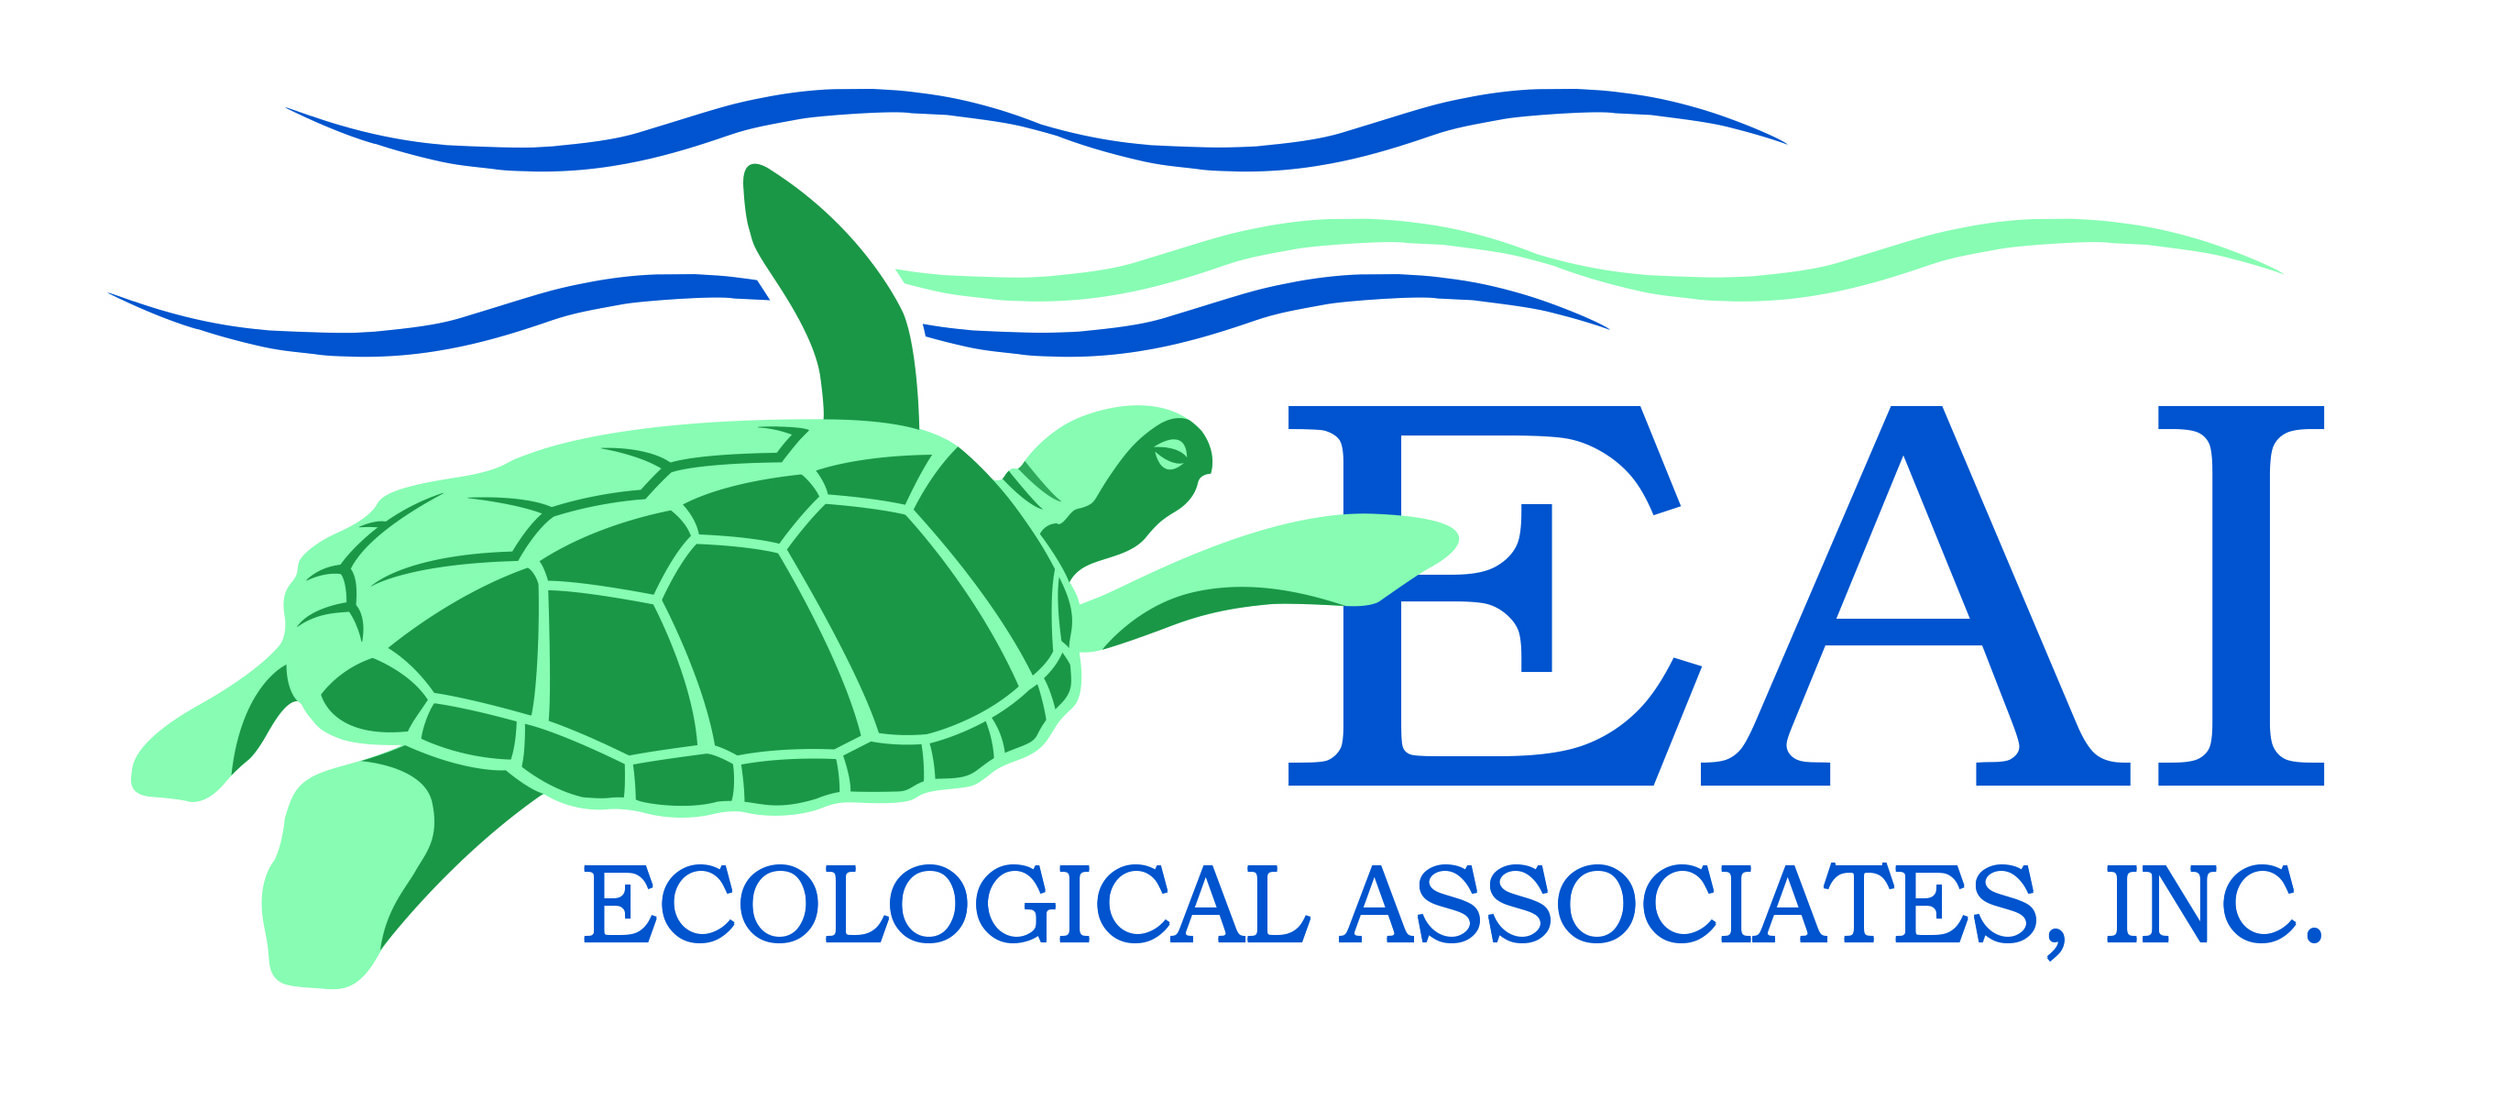 Ecologica Associates logo.jpg